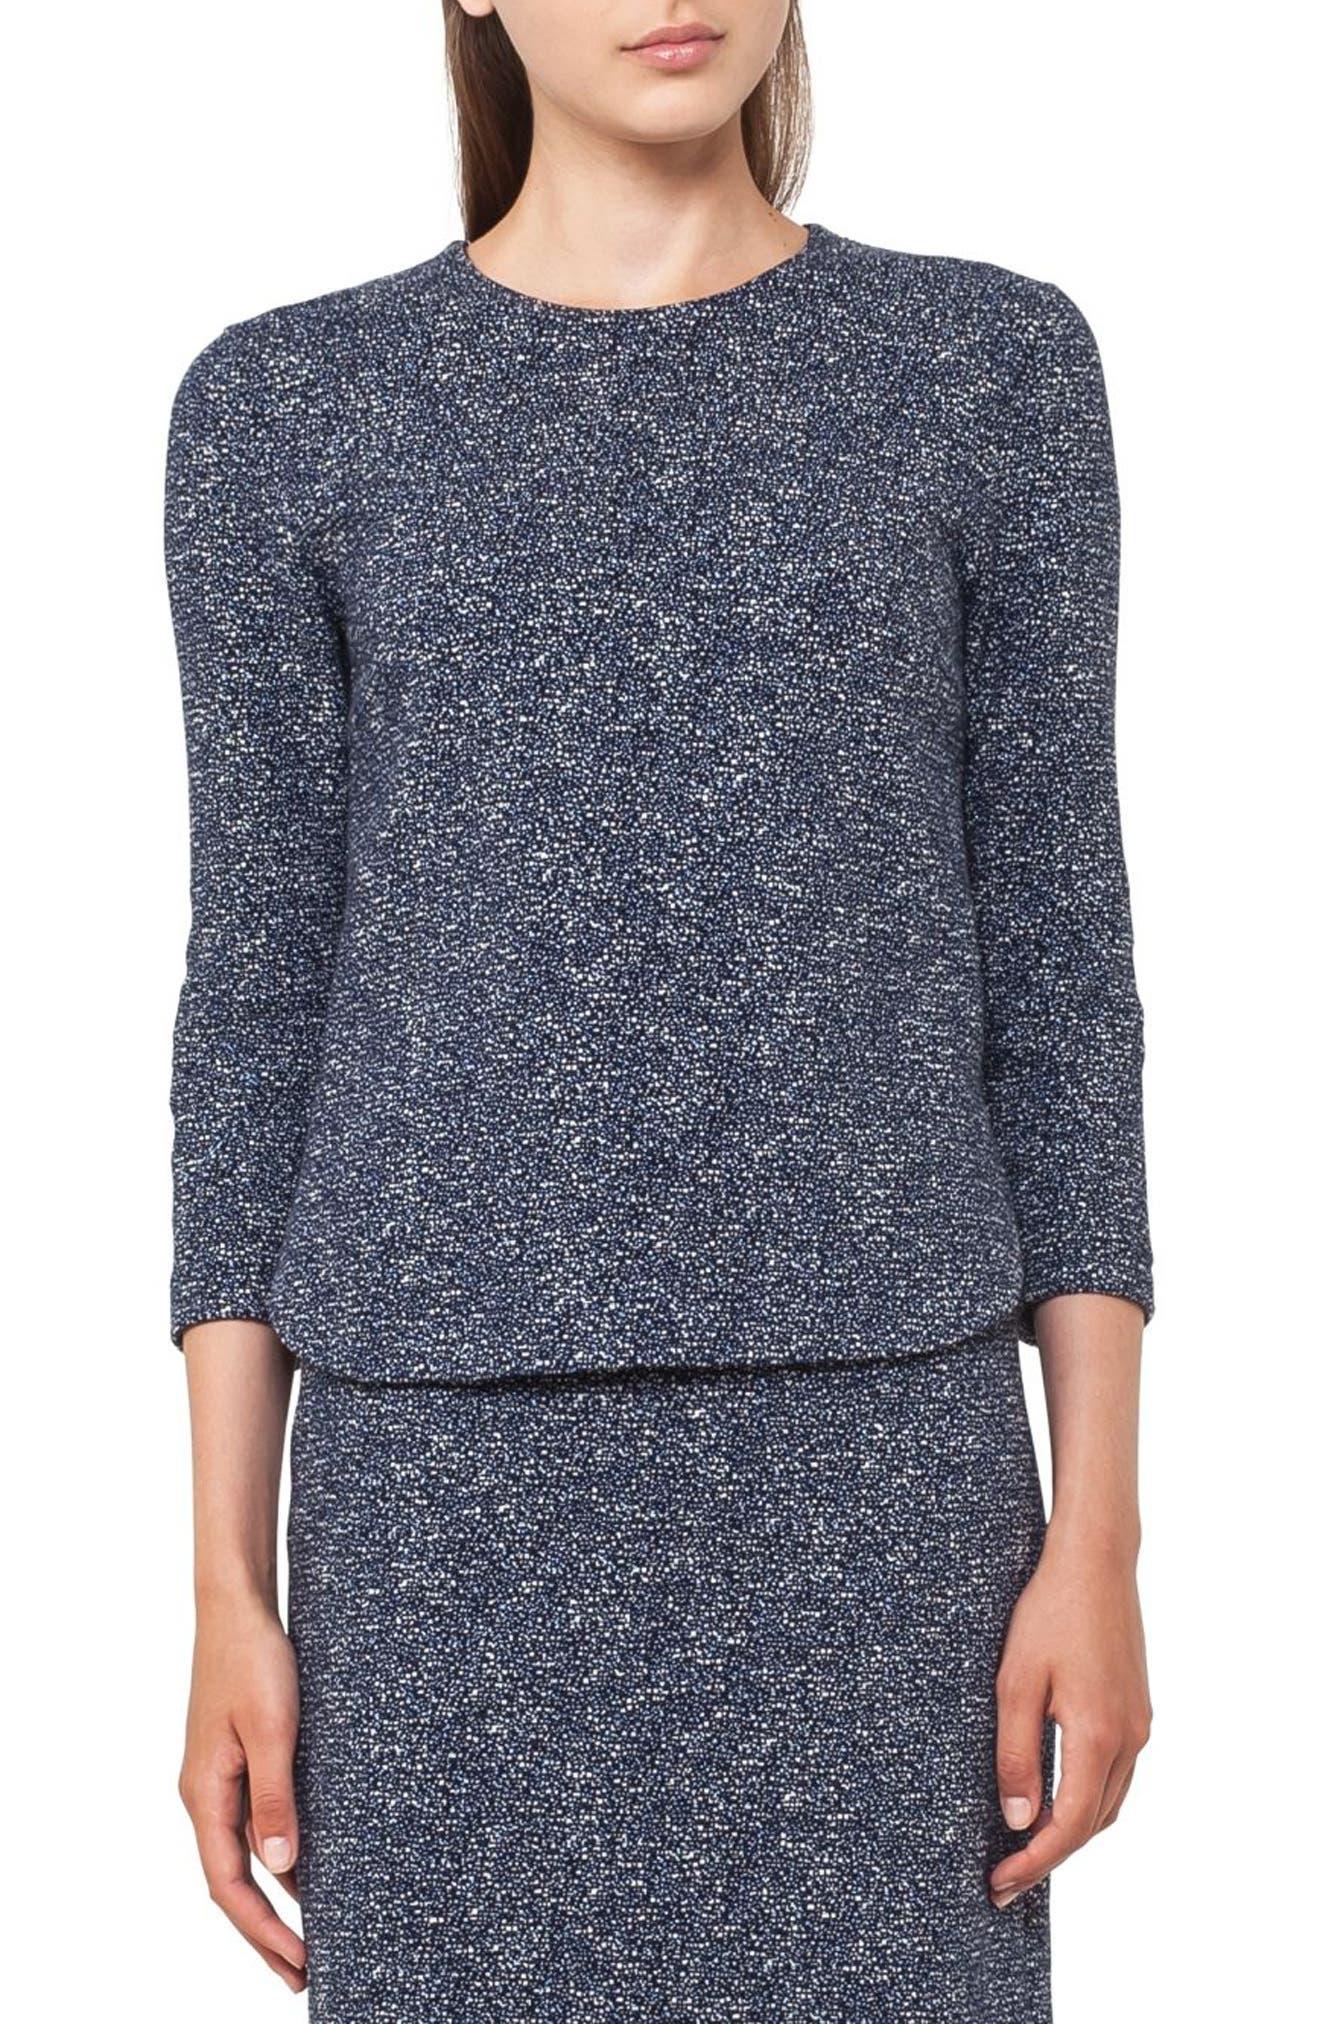 Jacquard Shirt,                         Main,                         color, 400